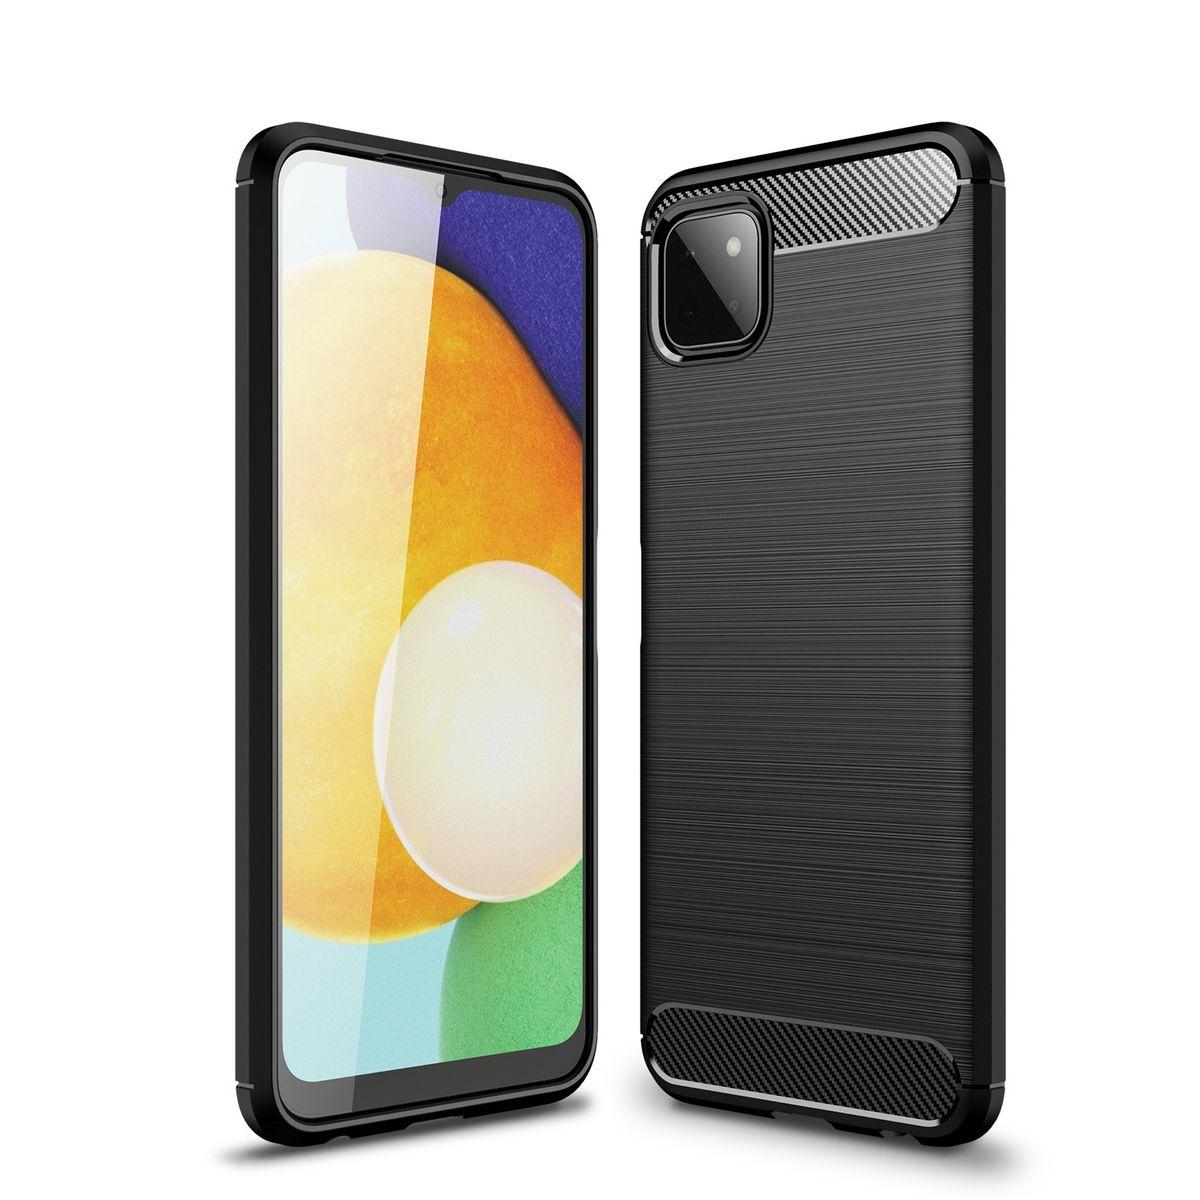 Samsung Galaxy A22 5G Handyhülle Schutzcase Backcover Schwarz